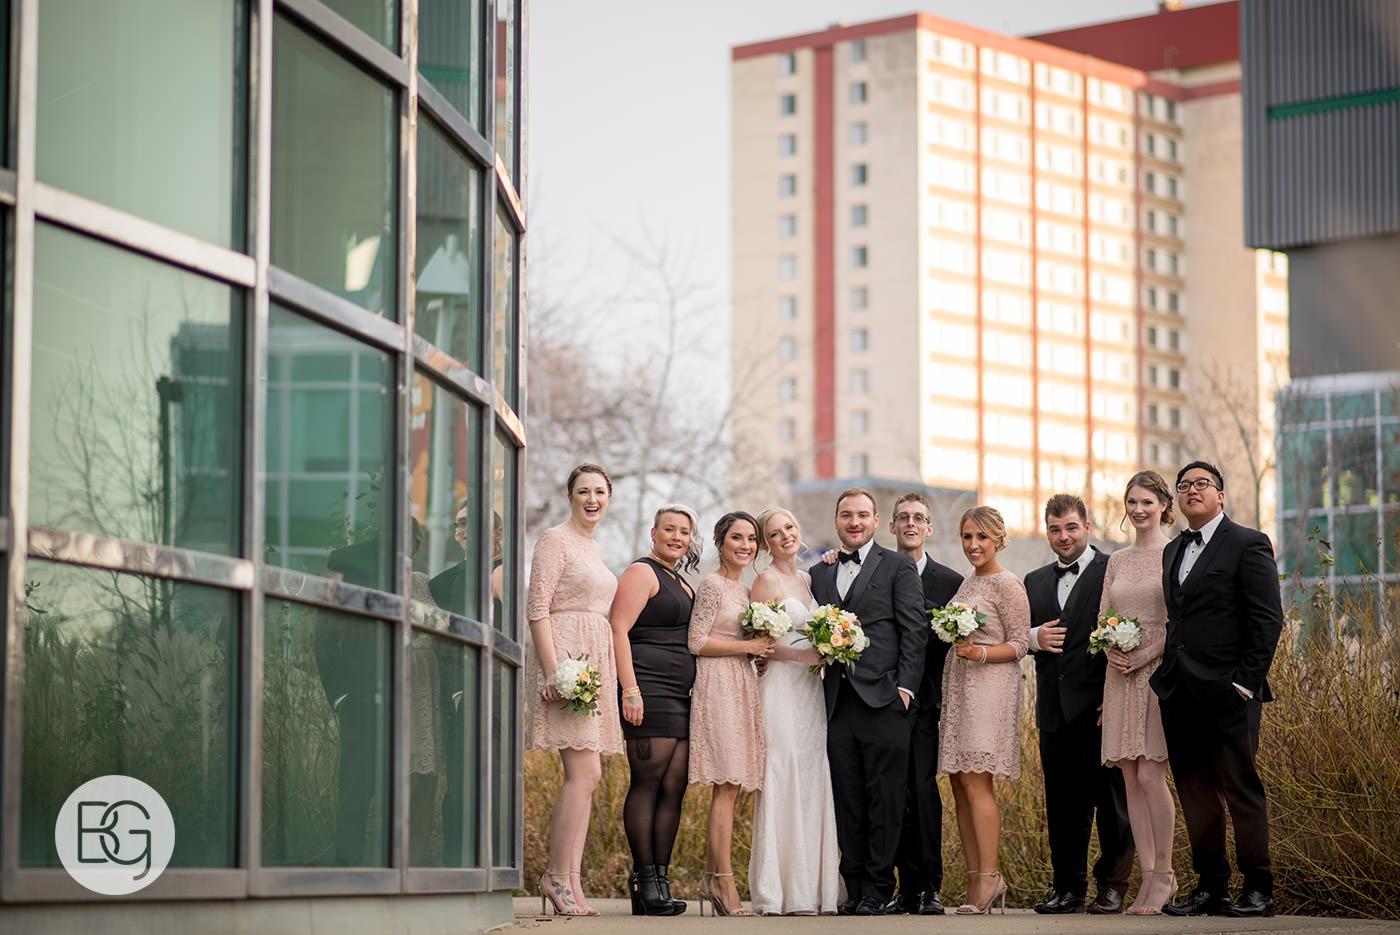 Edmonton_wedding_photographers_josh_sara_whyte_18.jpg